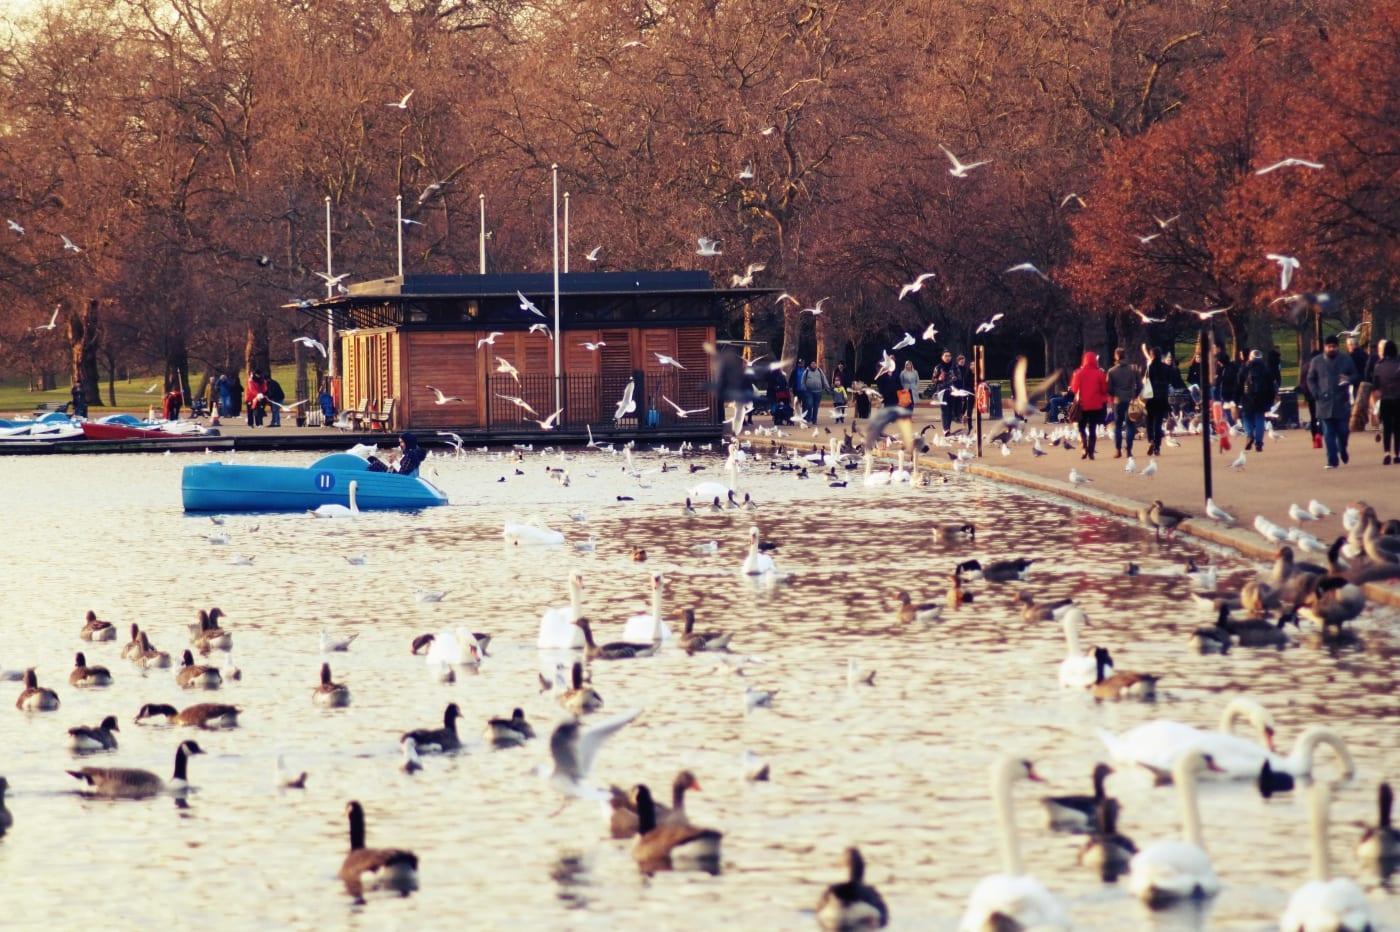 london-hyde-park-serpentine